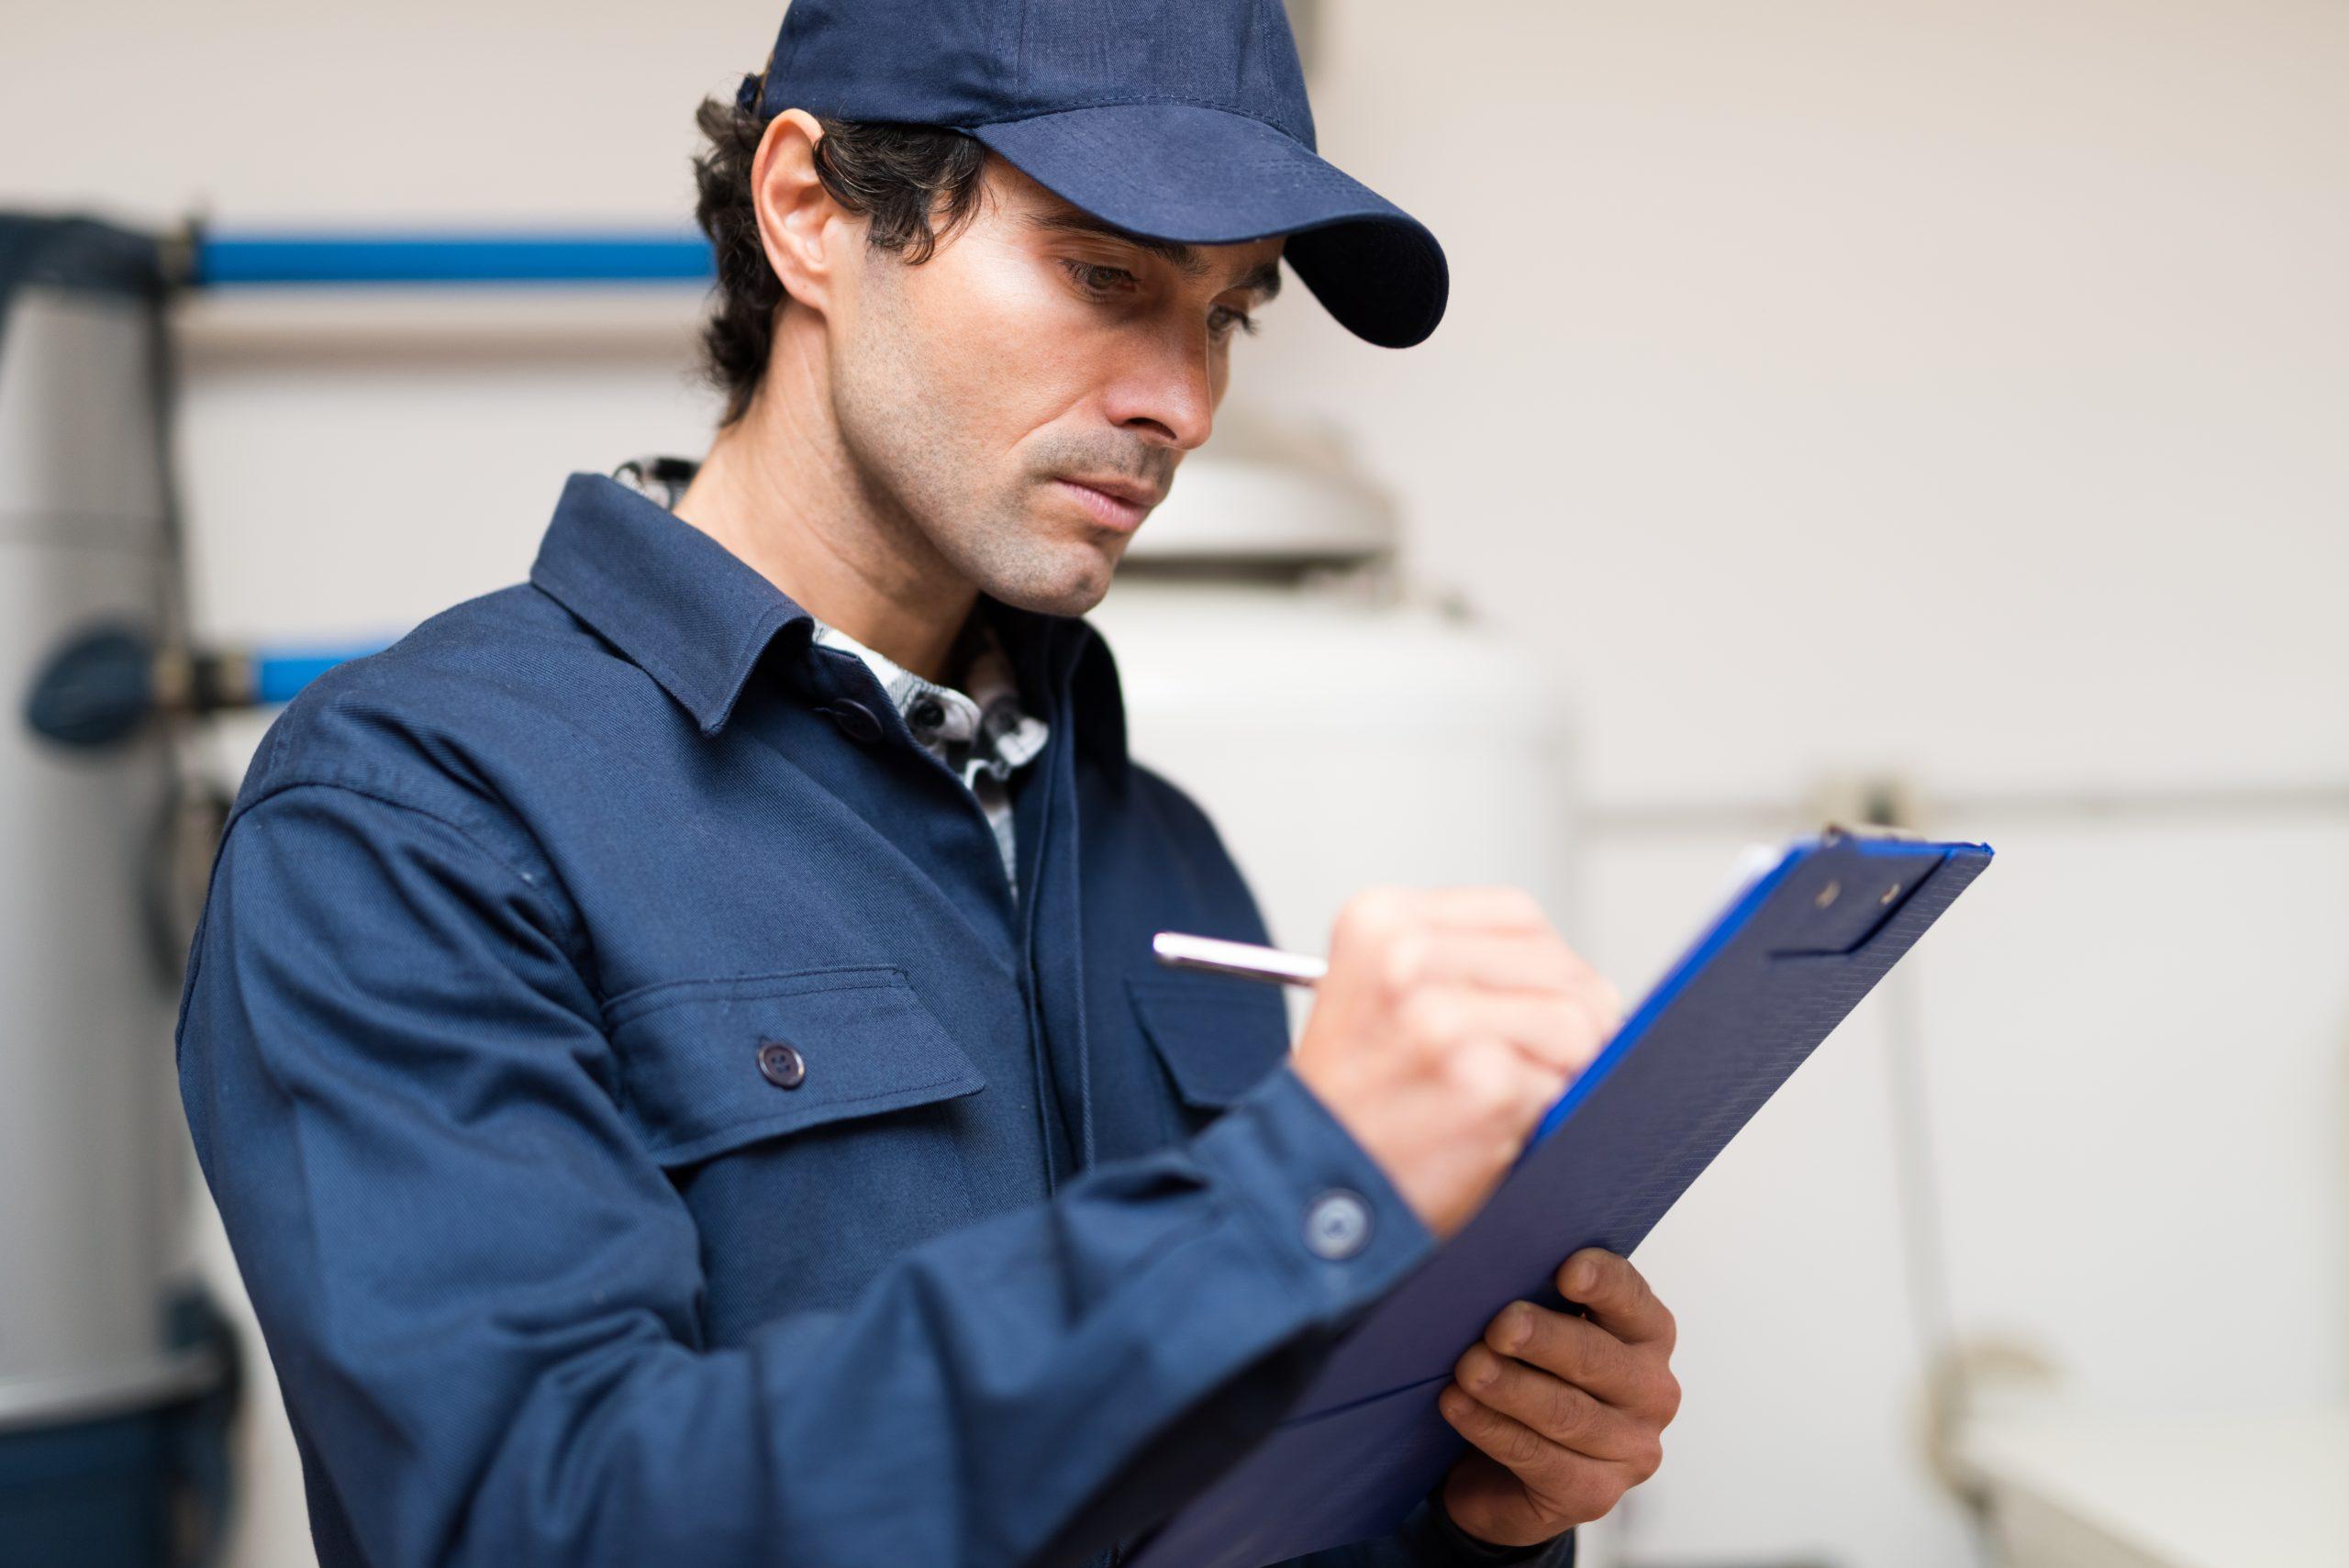 Benefits of a Preventative Maintenance Agreement